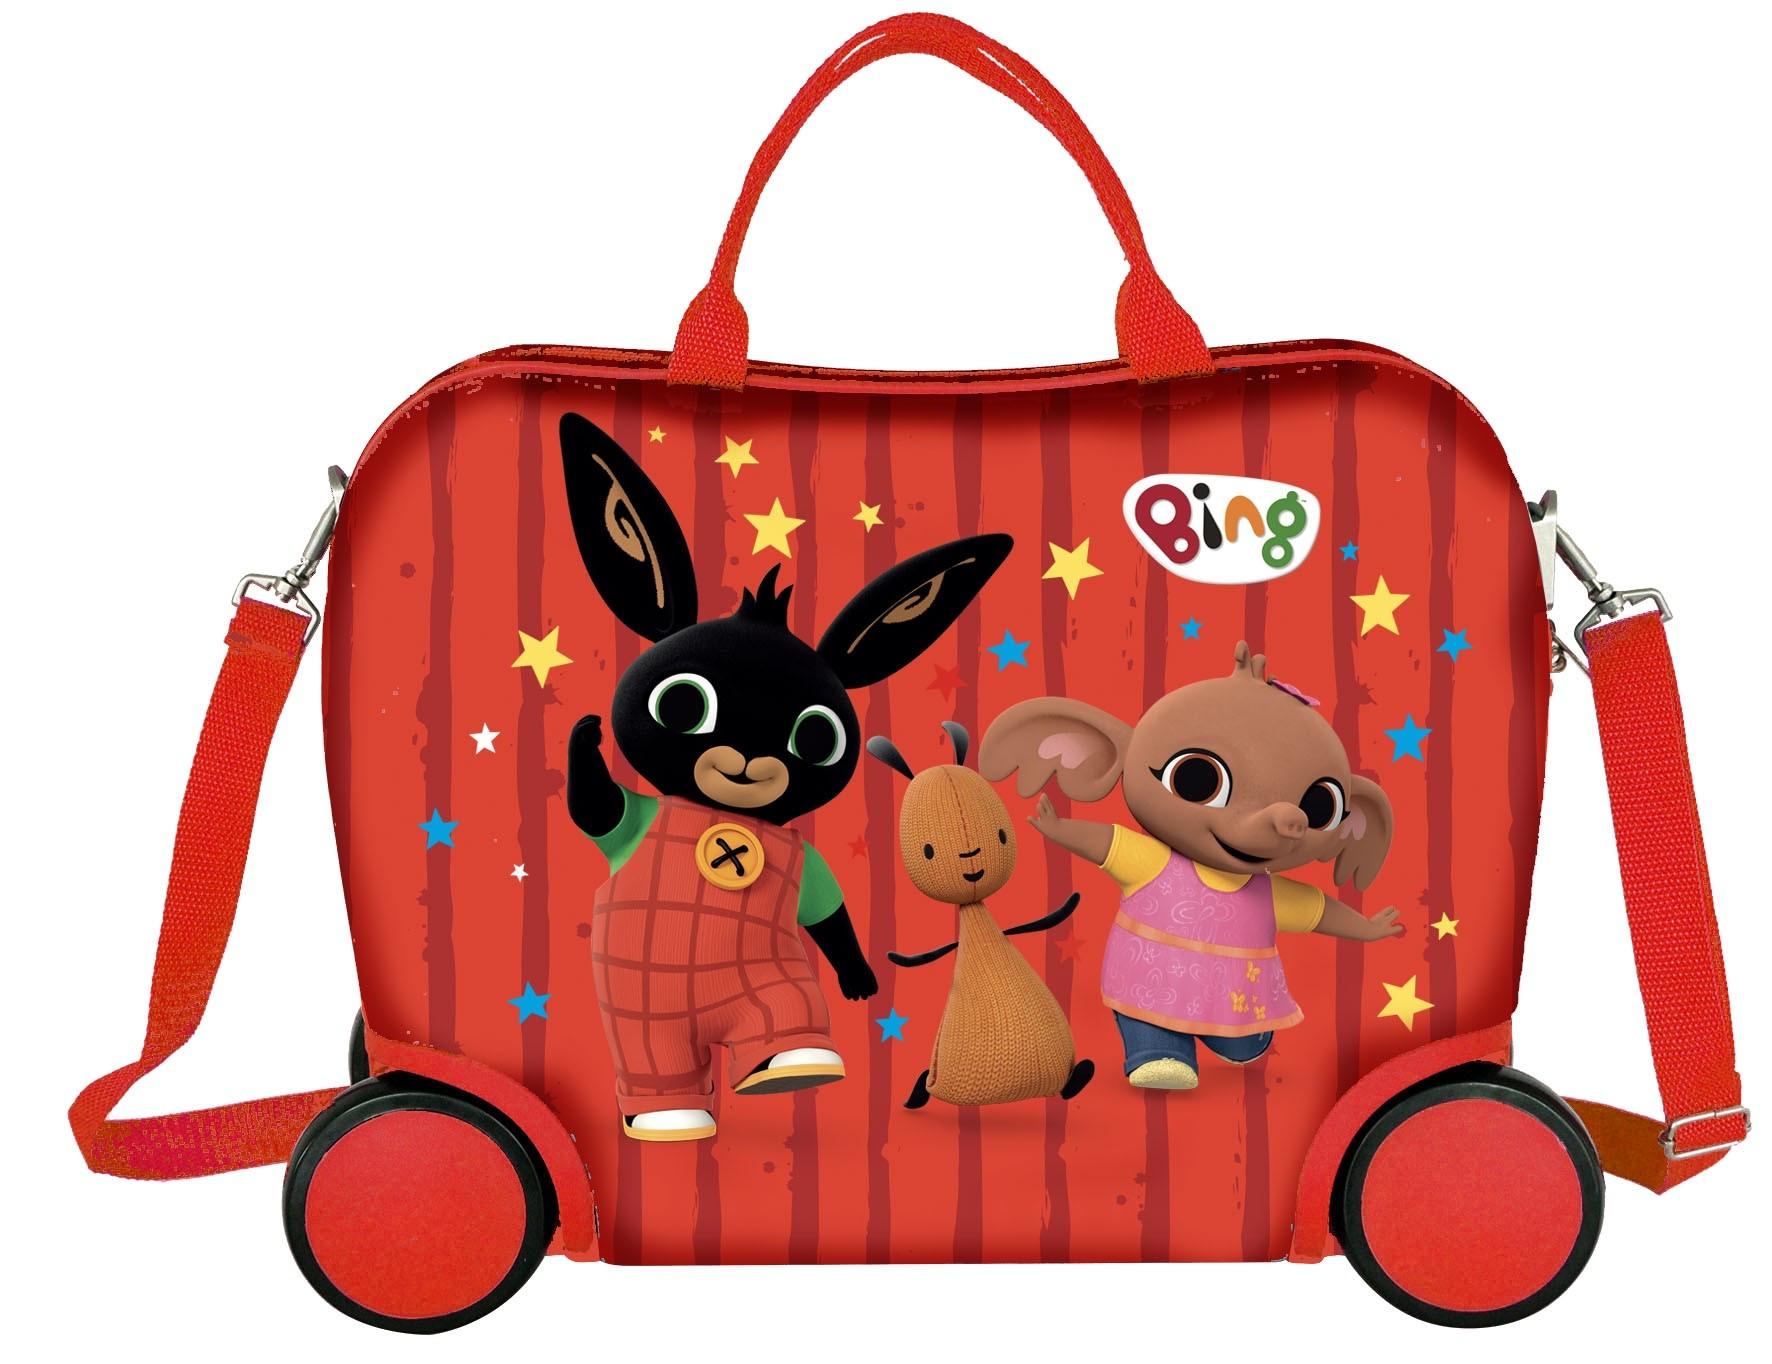 Bing Kinderkoffer